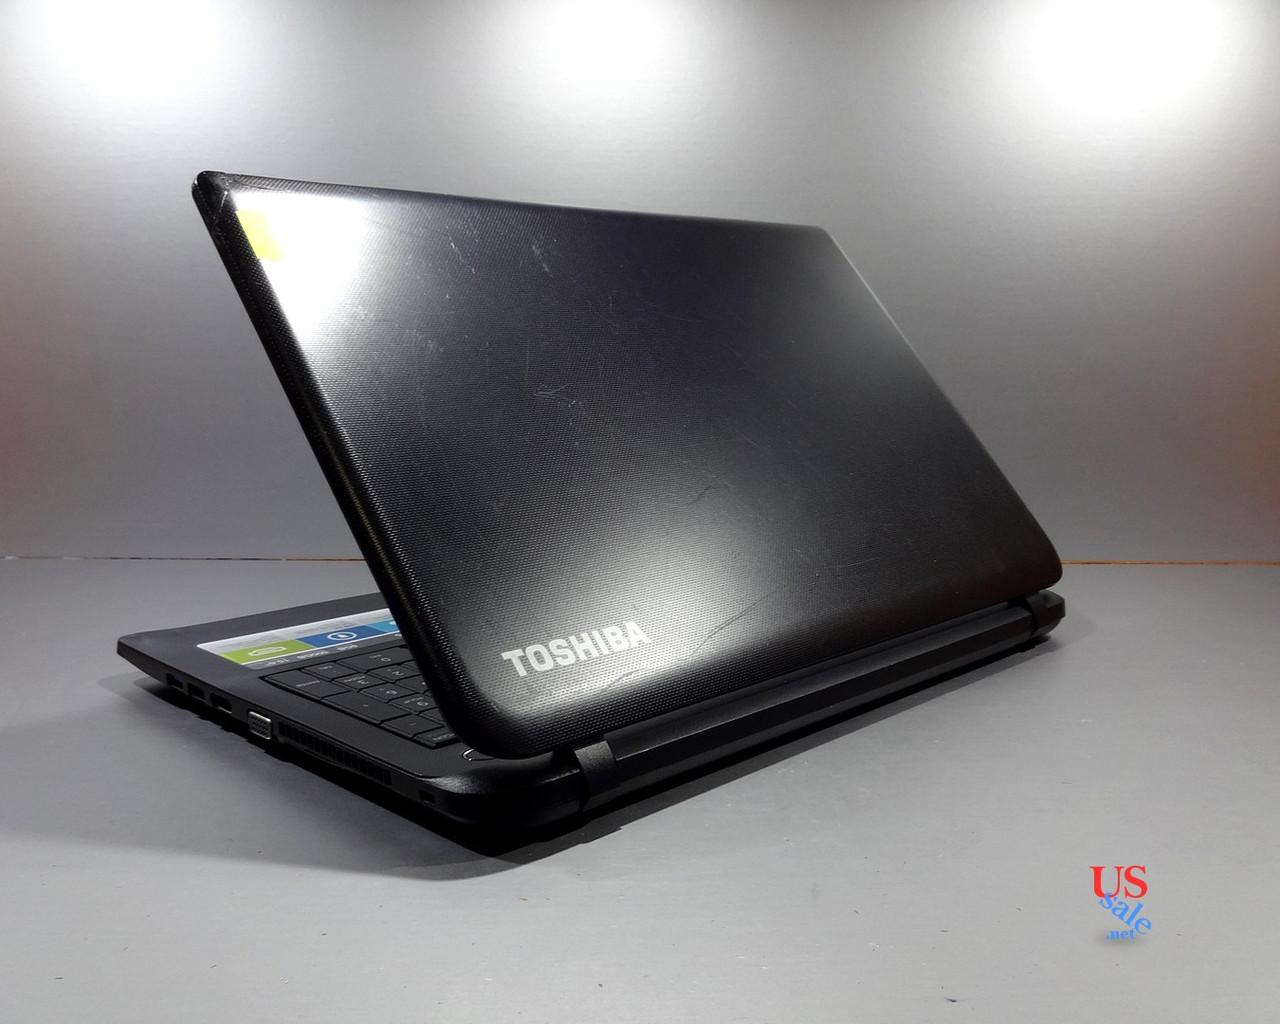 Ноутбук Toshiba Satellite C55-B5270 15,6″, Intel Pentium N3530 2.16Ghz, 8Gb DDR3, 750Gb. Гарантия!